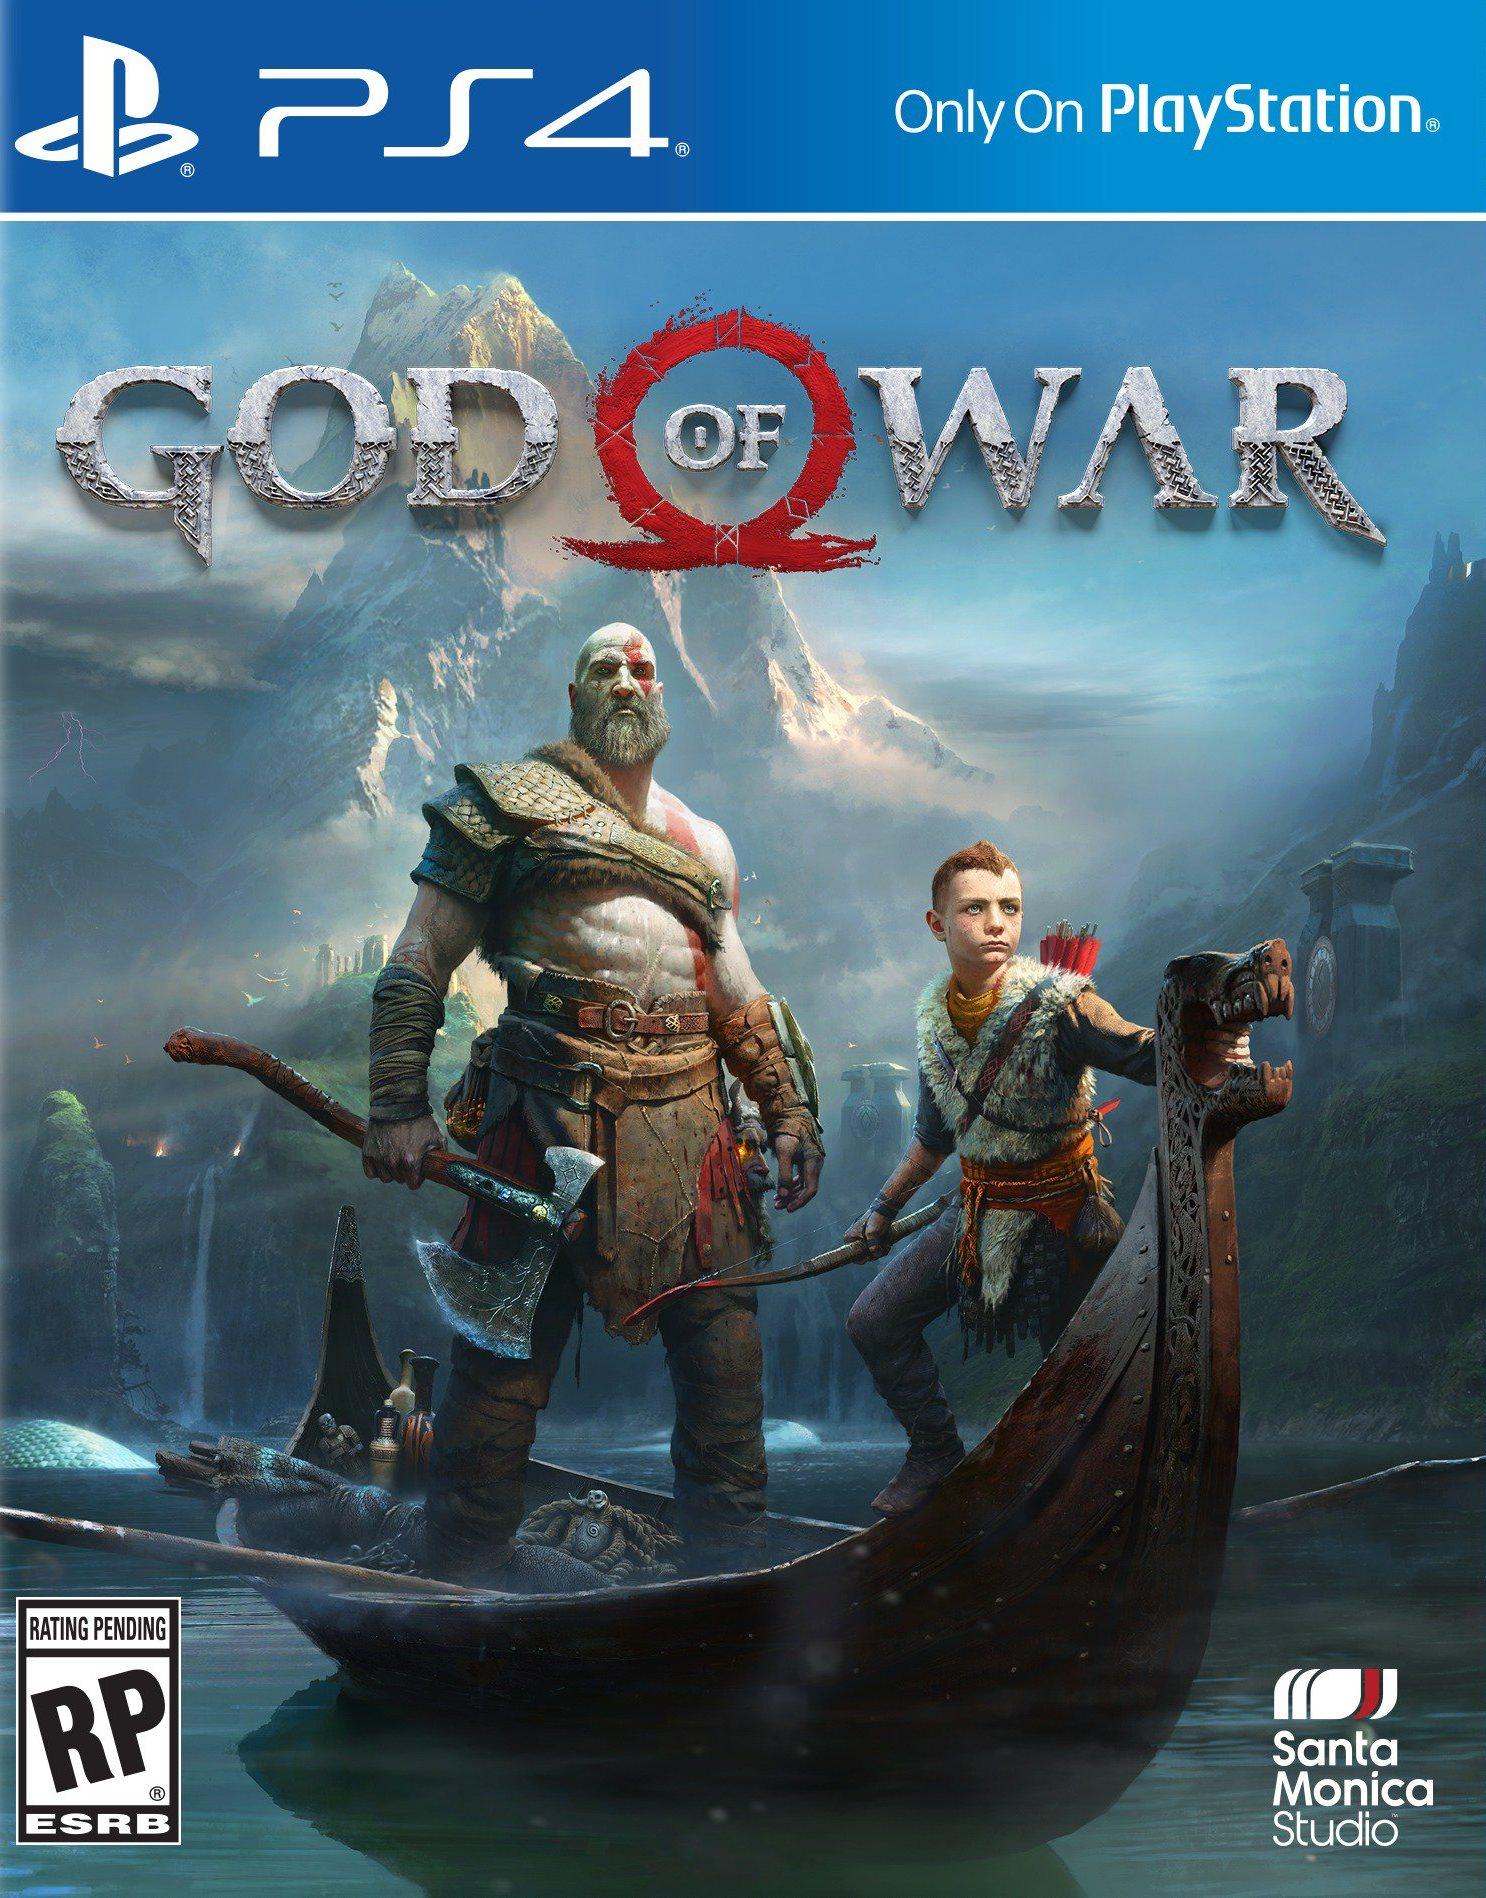 PLATFORM  PlayStation 4   PUBLISHER  Sony Interactive Entertainment (SIE)   DEVELOPER   SIE Santa Monica Studios    RELEASED  04/20/2018